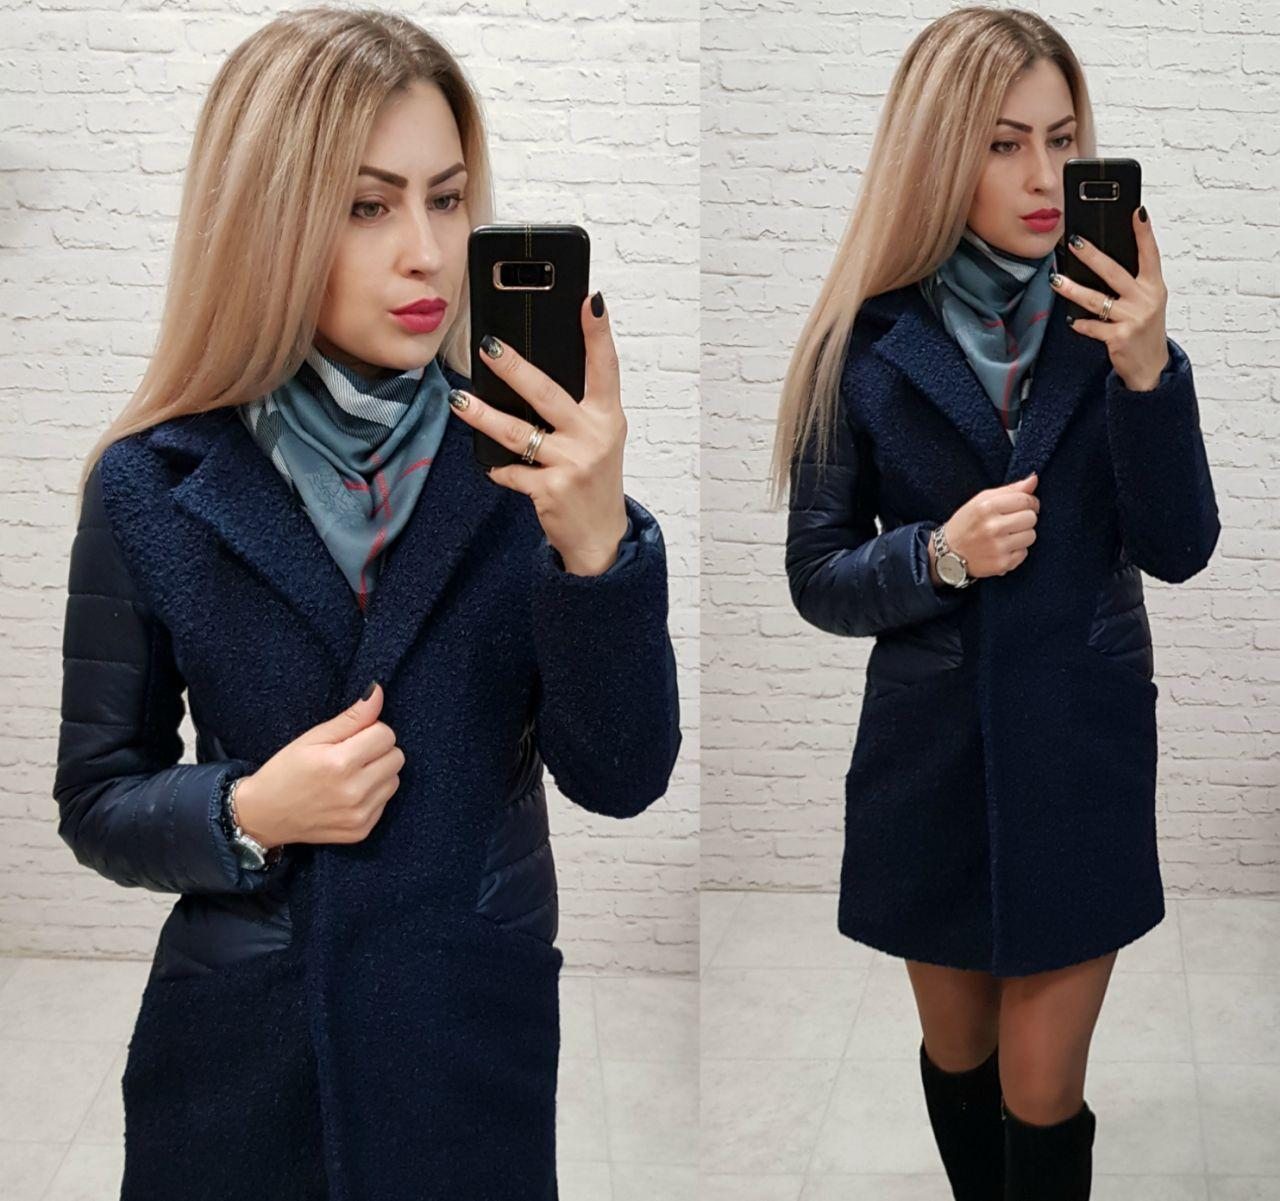 Пальто, арт 821, ткань букле, цвет темно синий